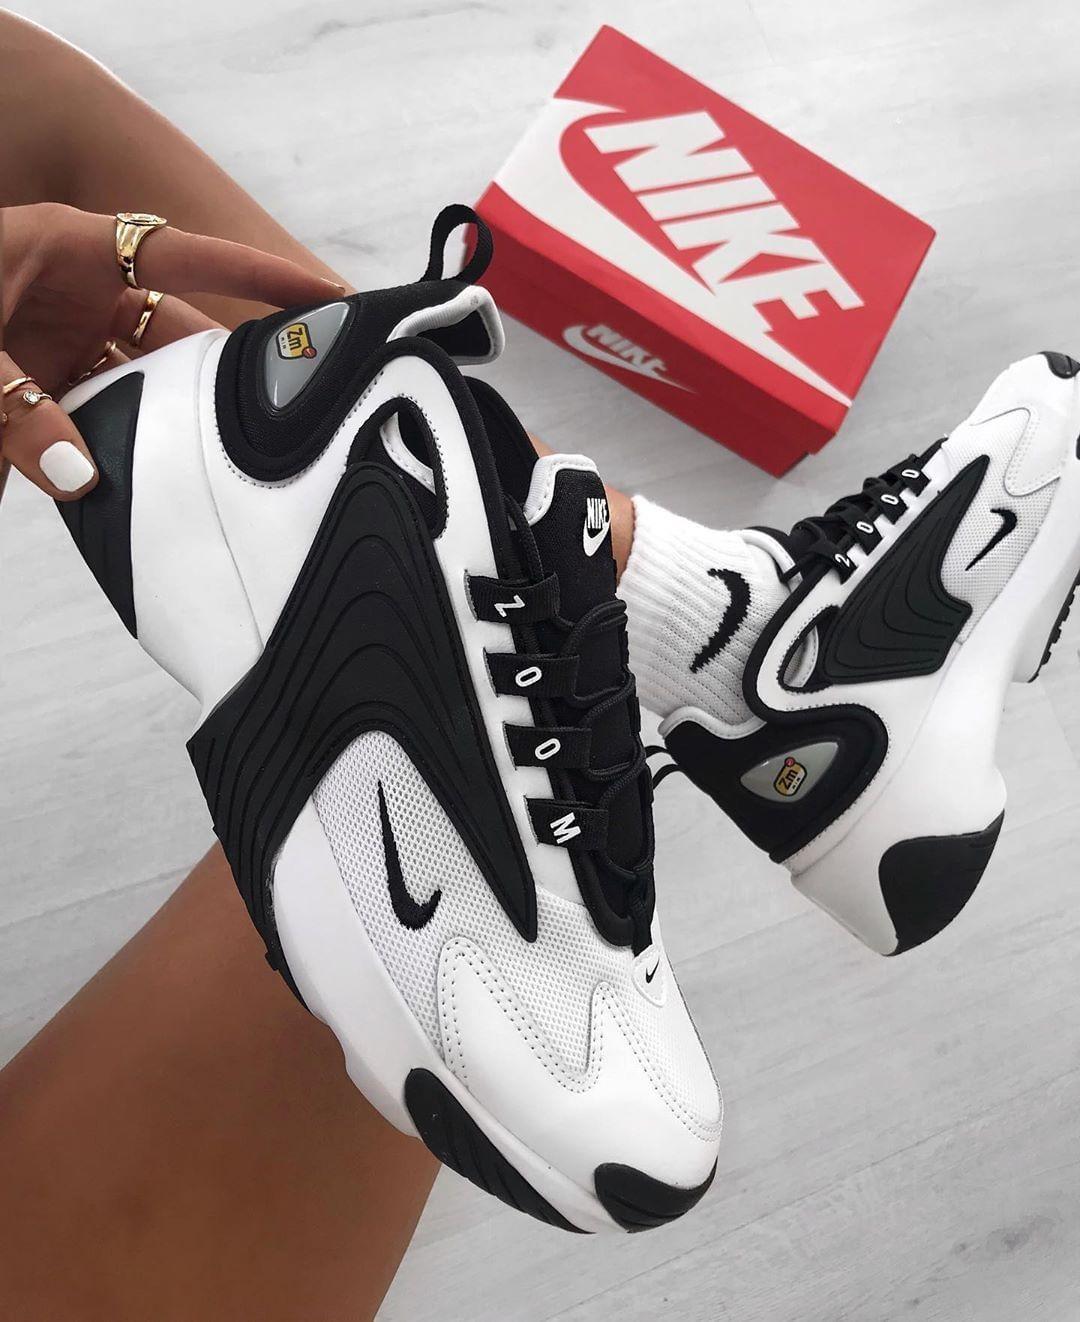 Nike Zoom 2K in weiss AO0269 101 | Nike schuhe schwarz